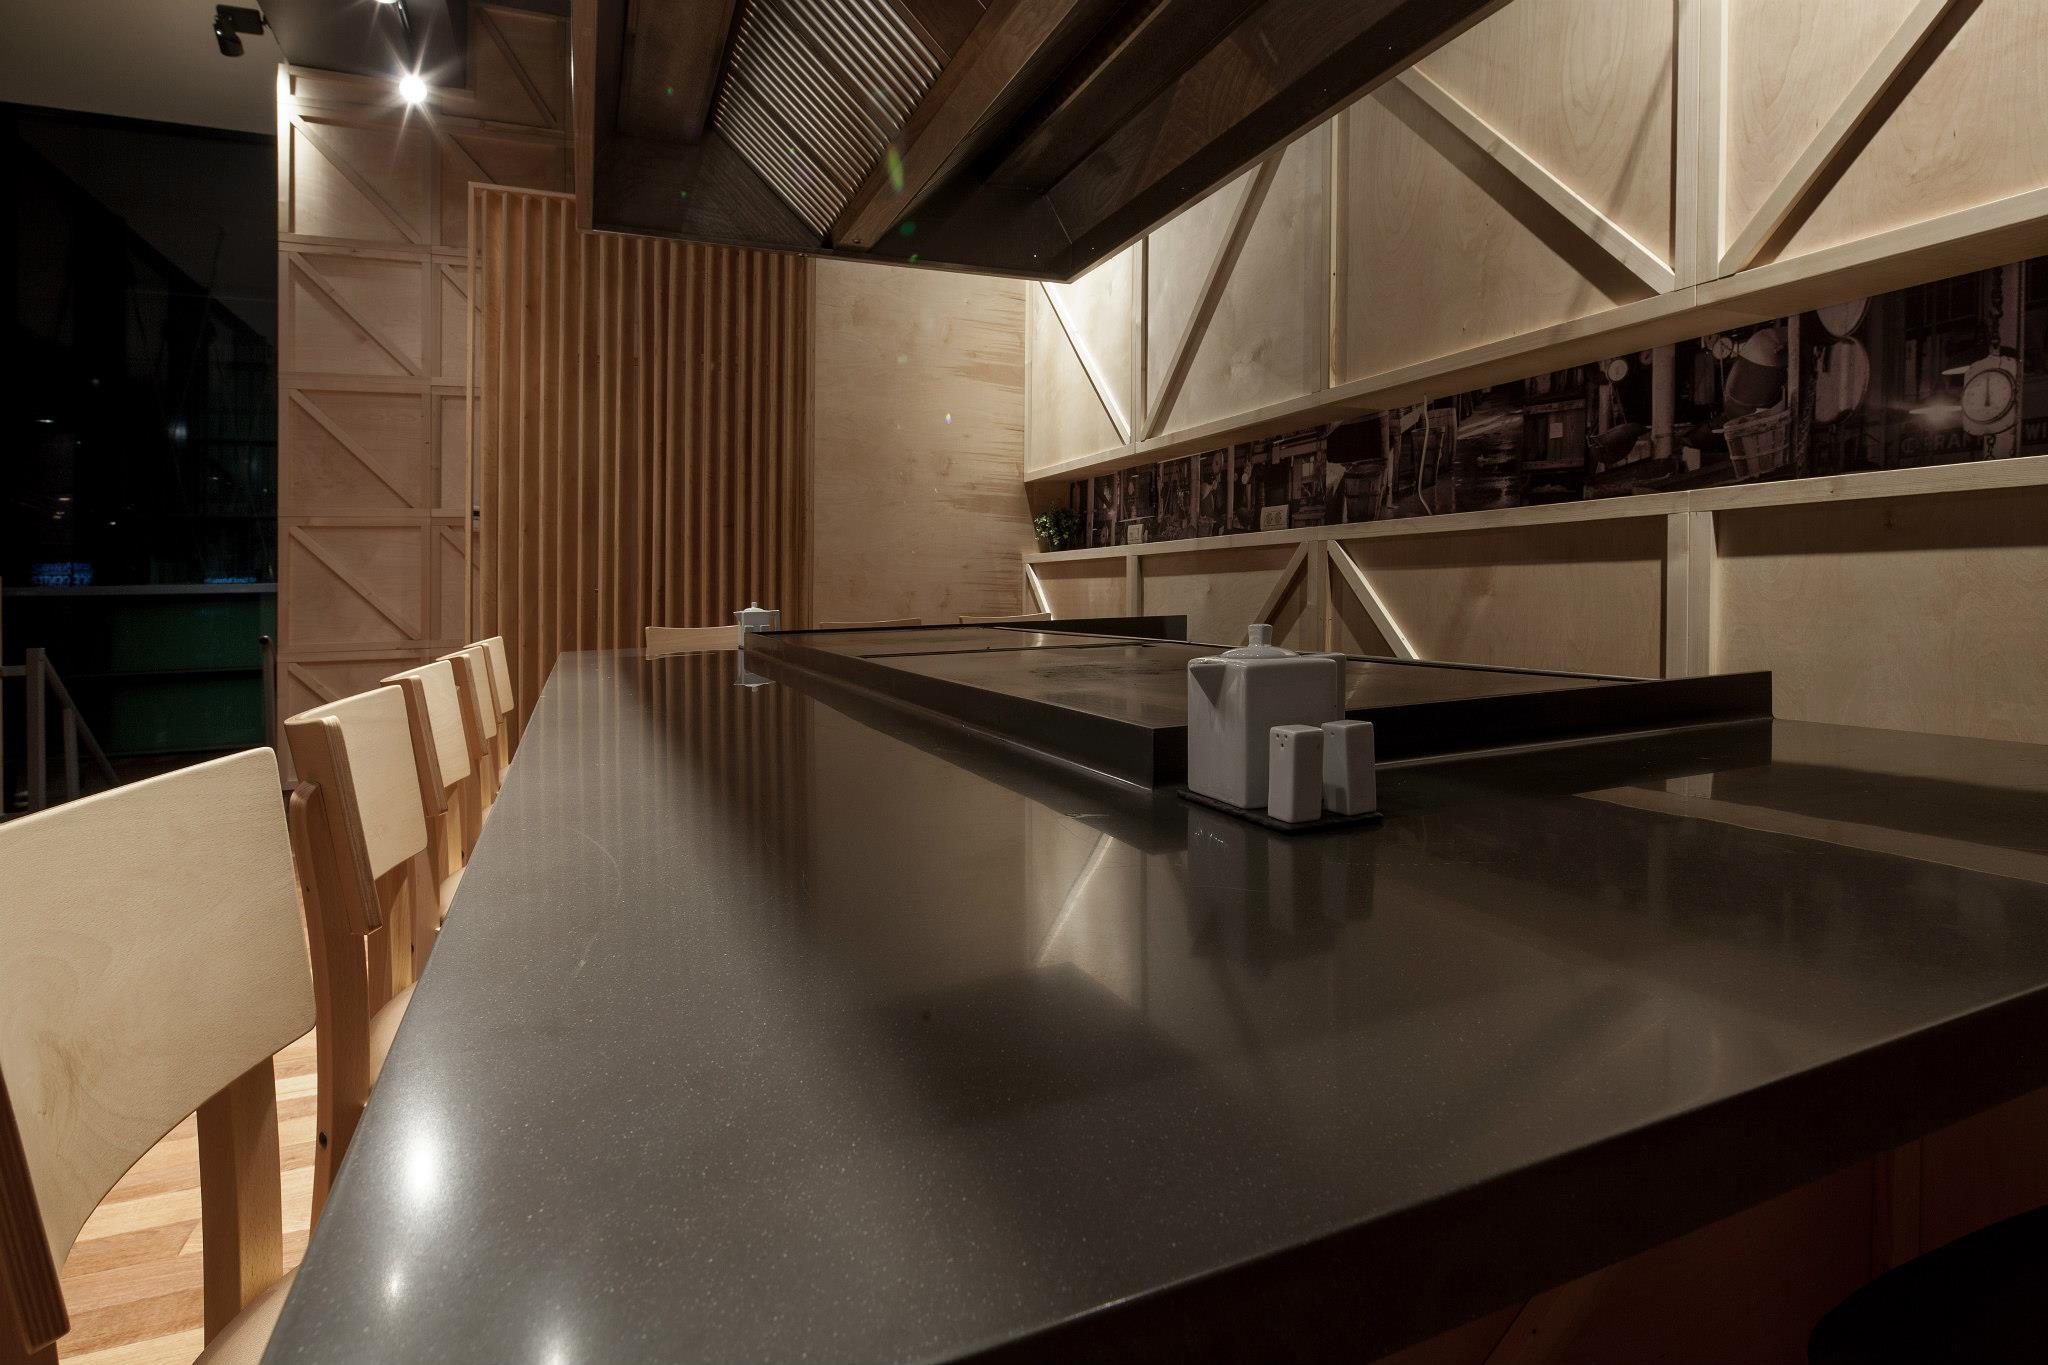 YOSHI-Sushi-Teppanyaki-Trivenus-Ama-Design-21